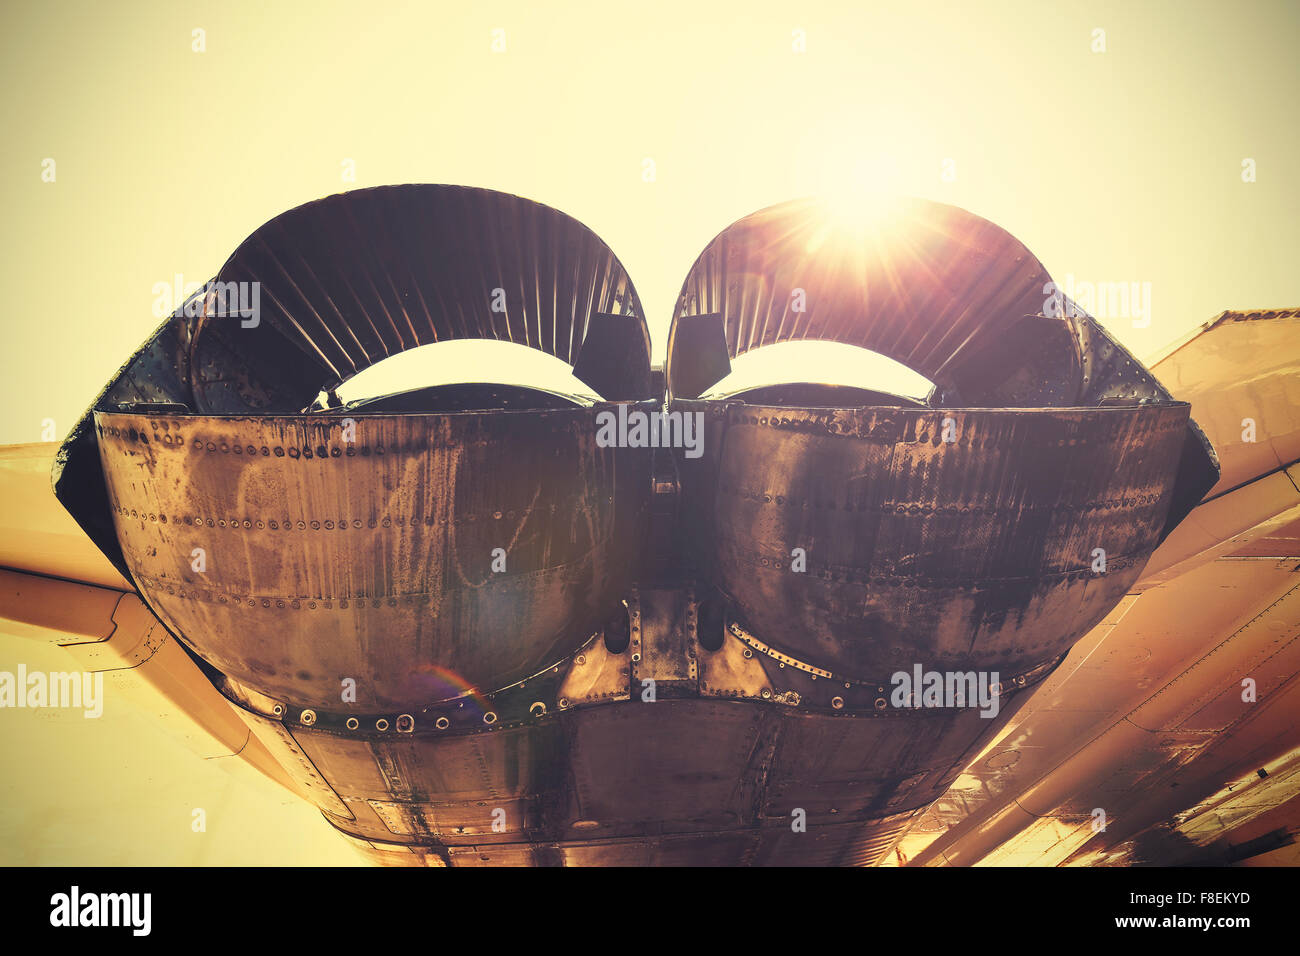 Retro-getönten Jet Auspuffrohre gegen Sonne. Stockbild